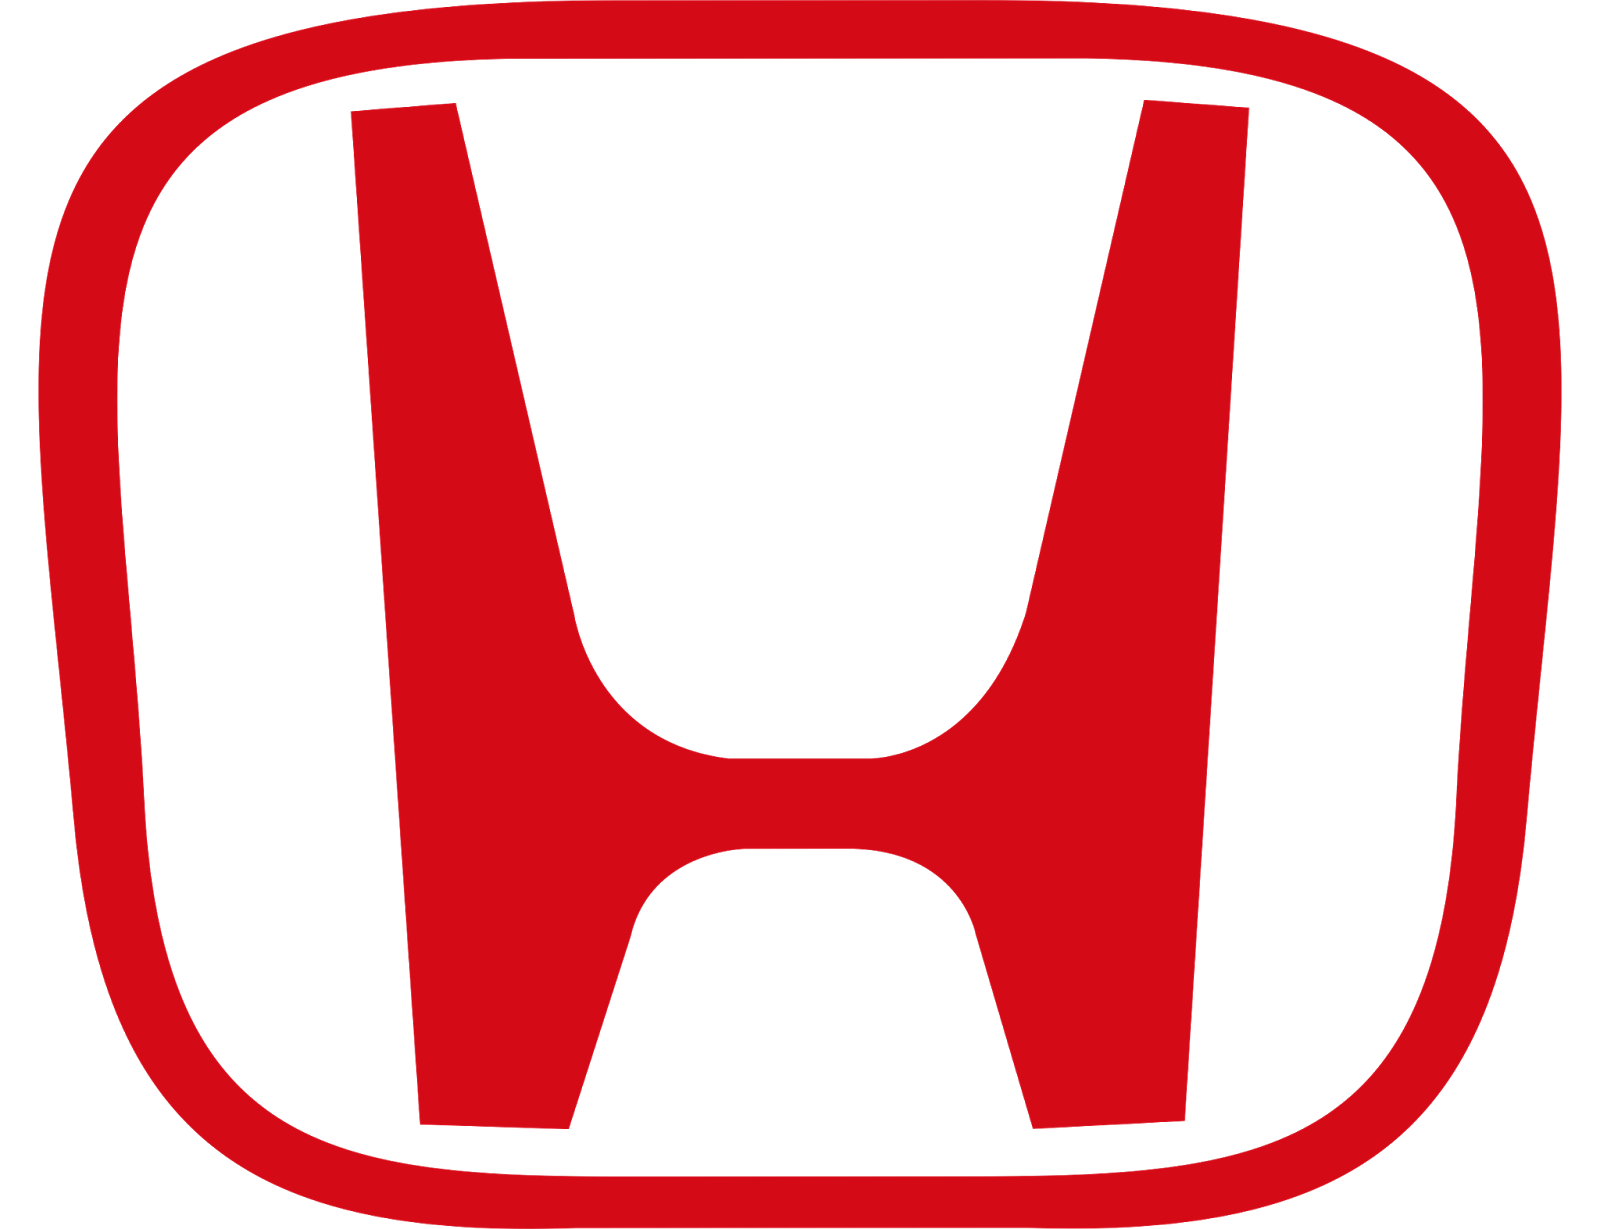 image logo honda png logopedia fandom powered by wikia rh logos wikia com longo honda dealer longo honda